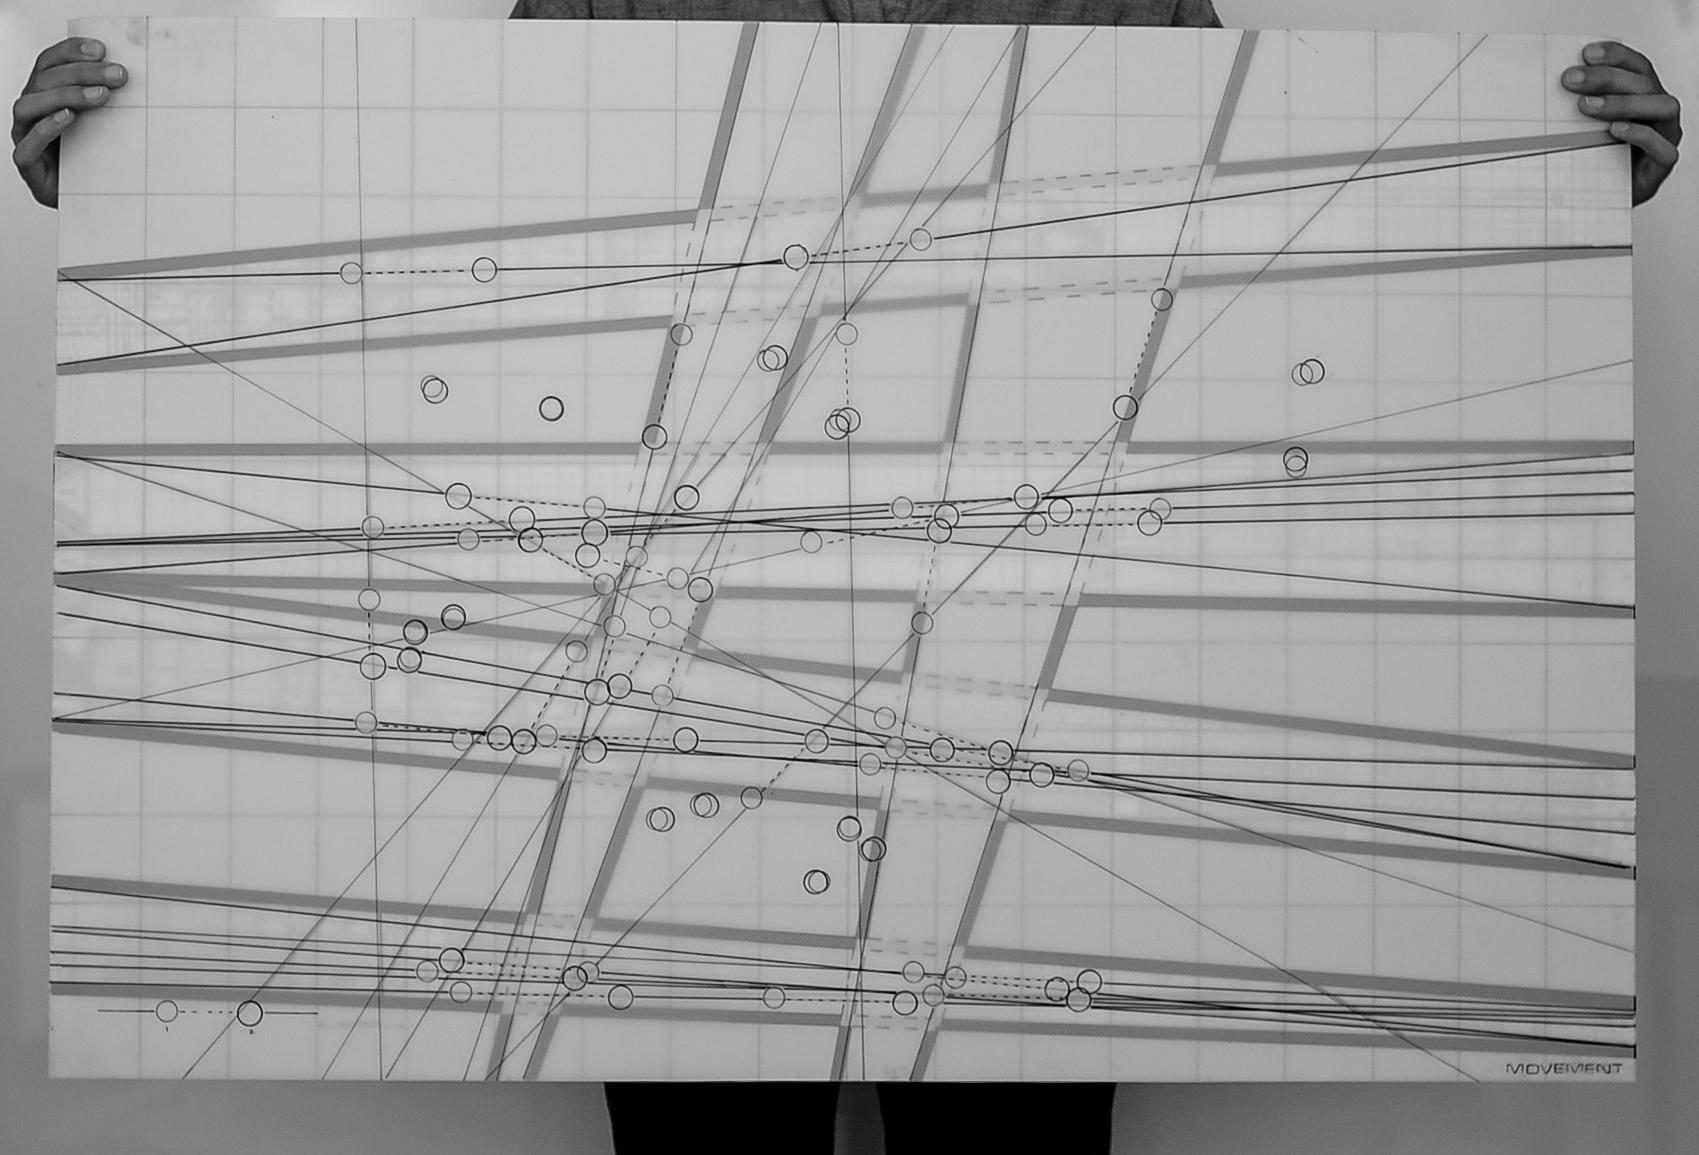 Layered drawings